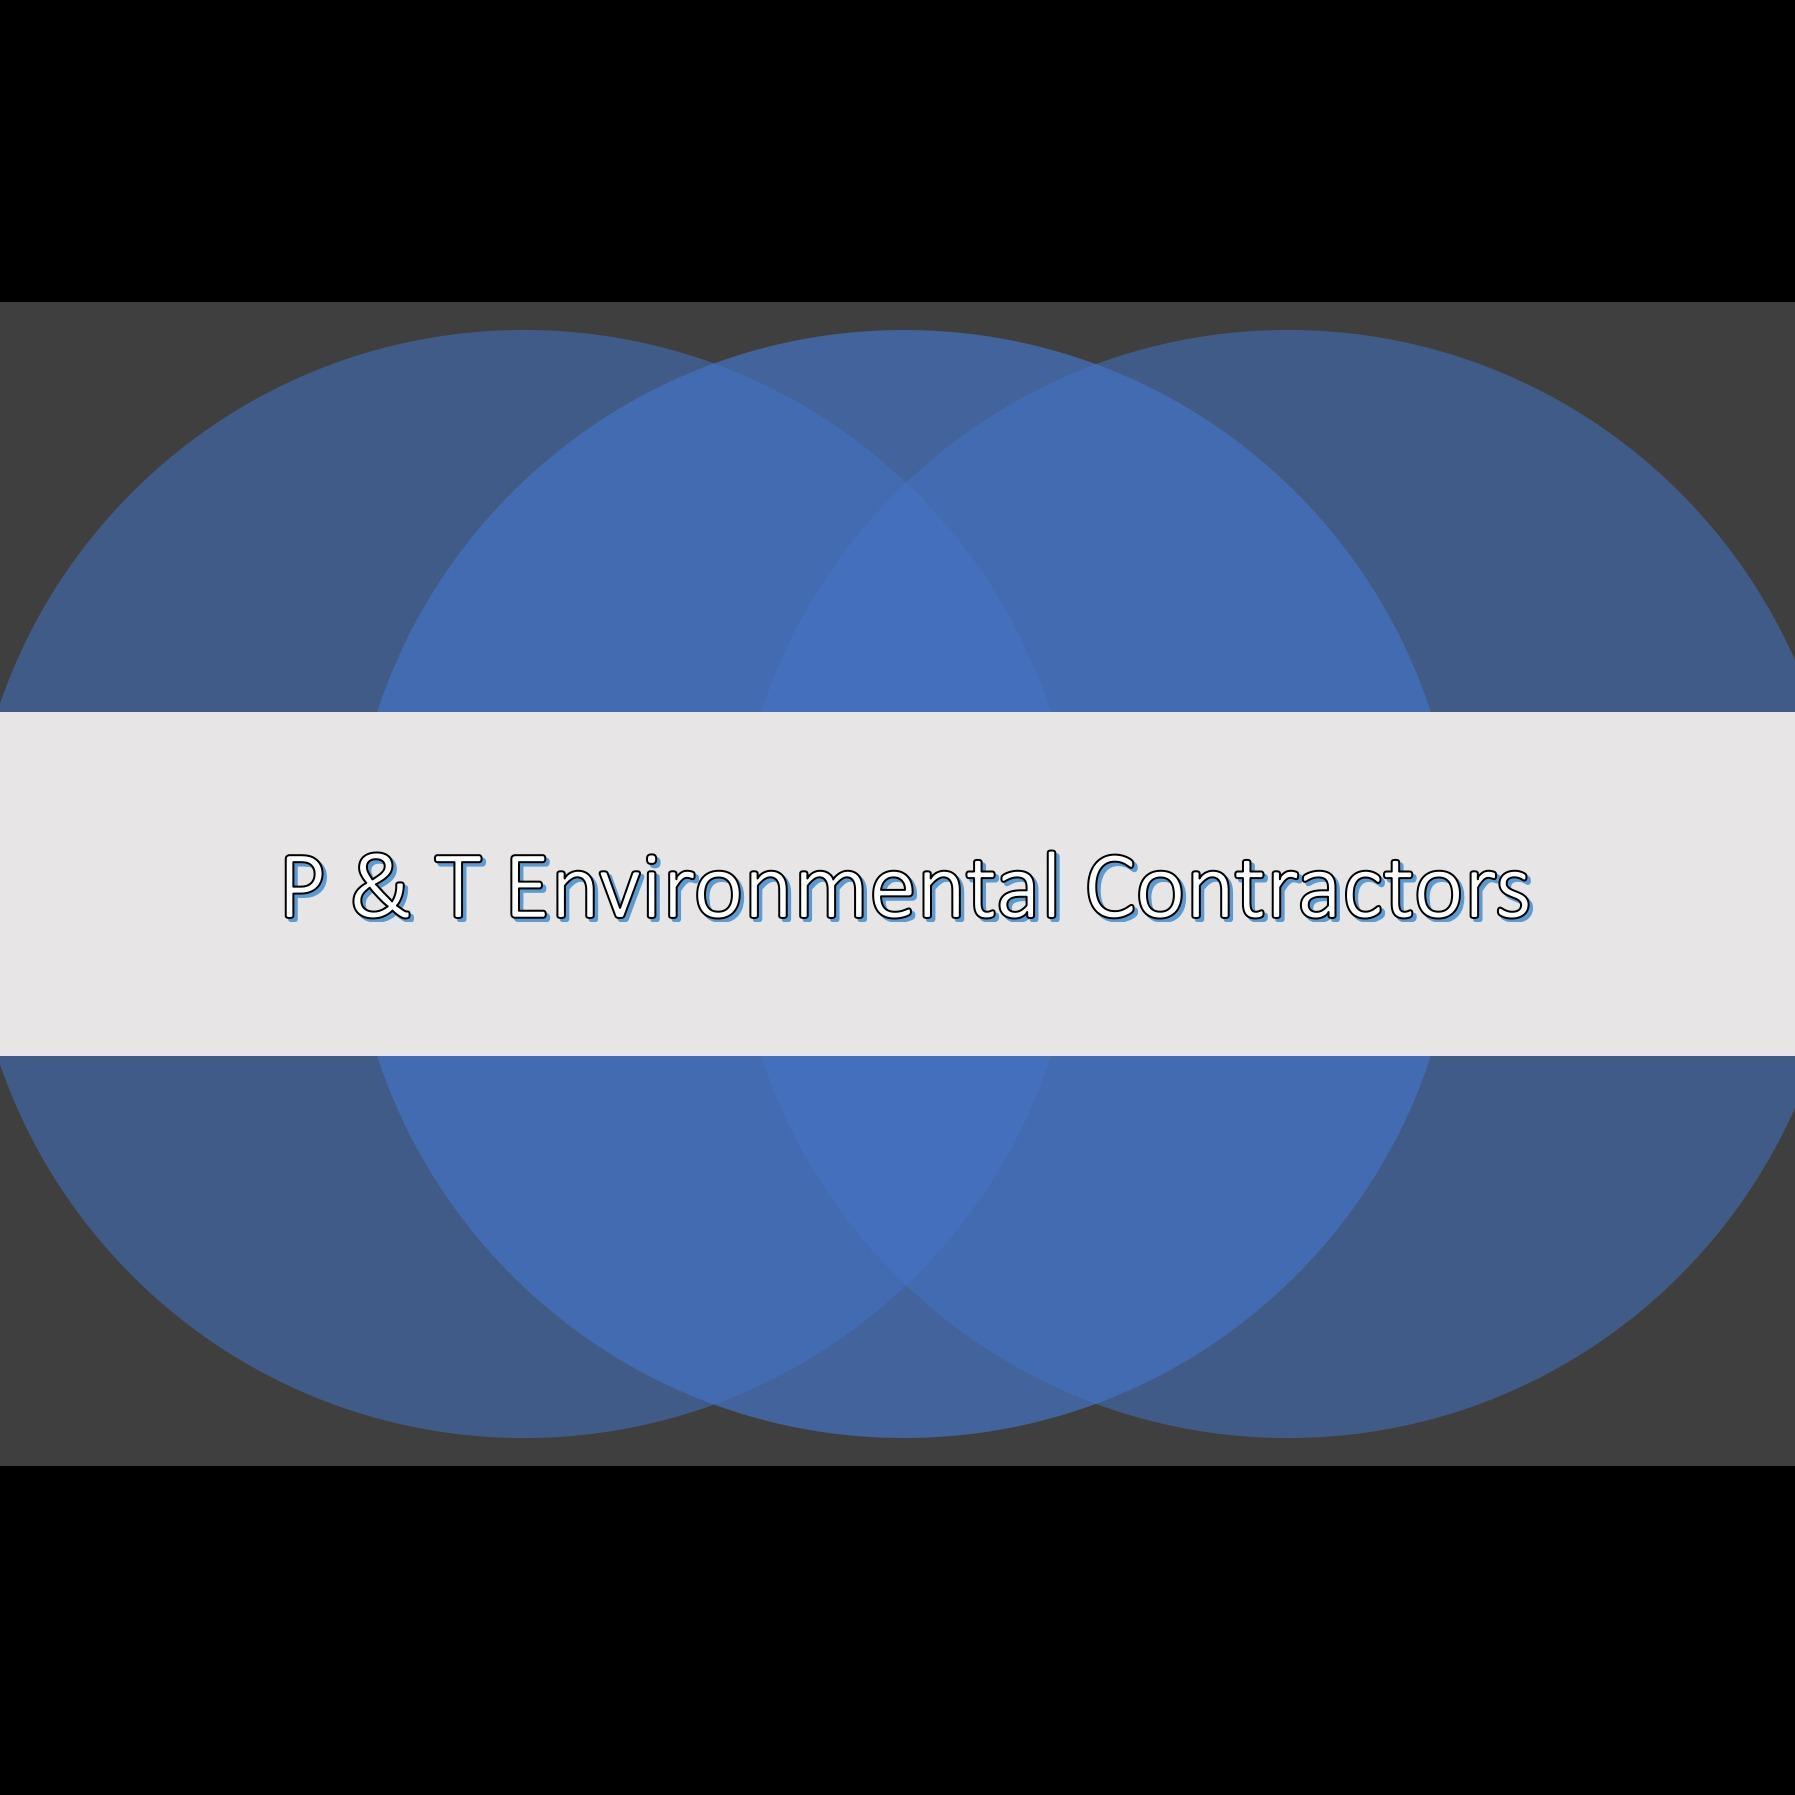 P & T Environmental Contractors image 0